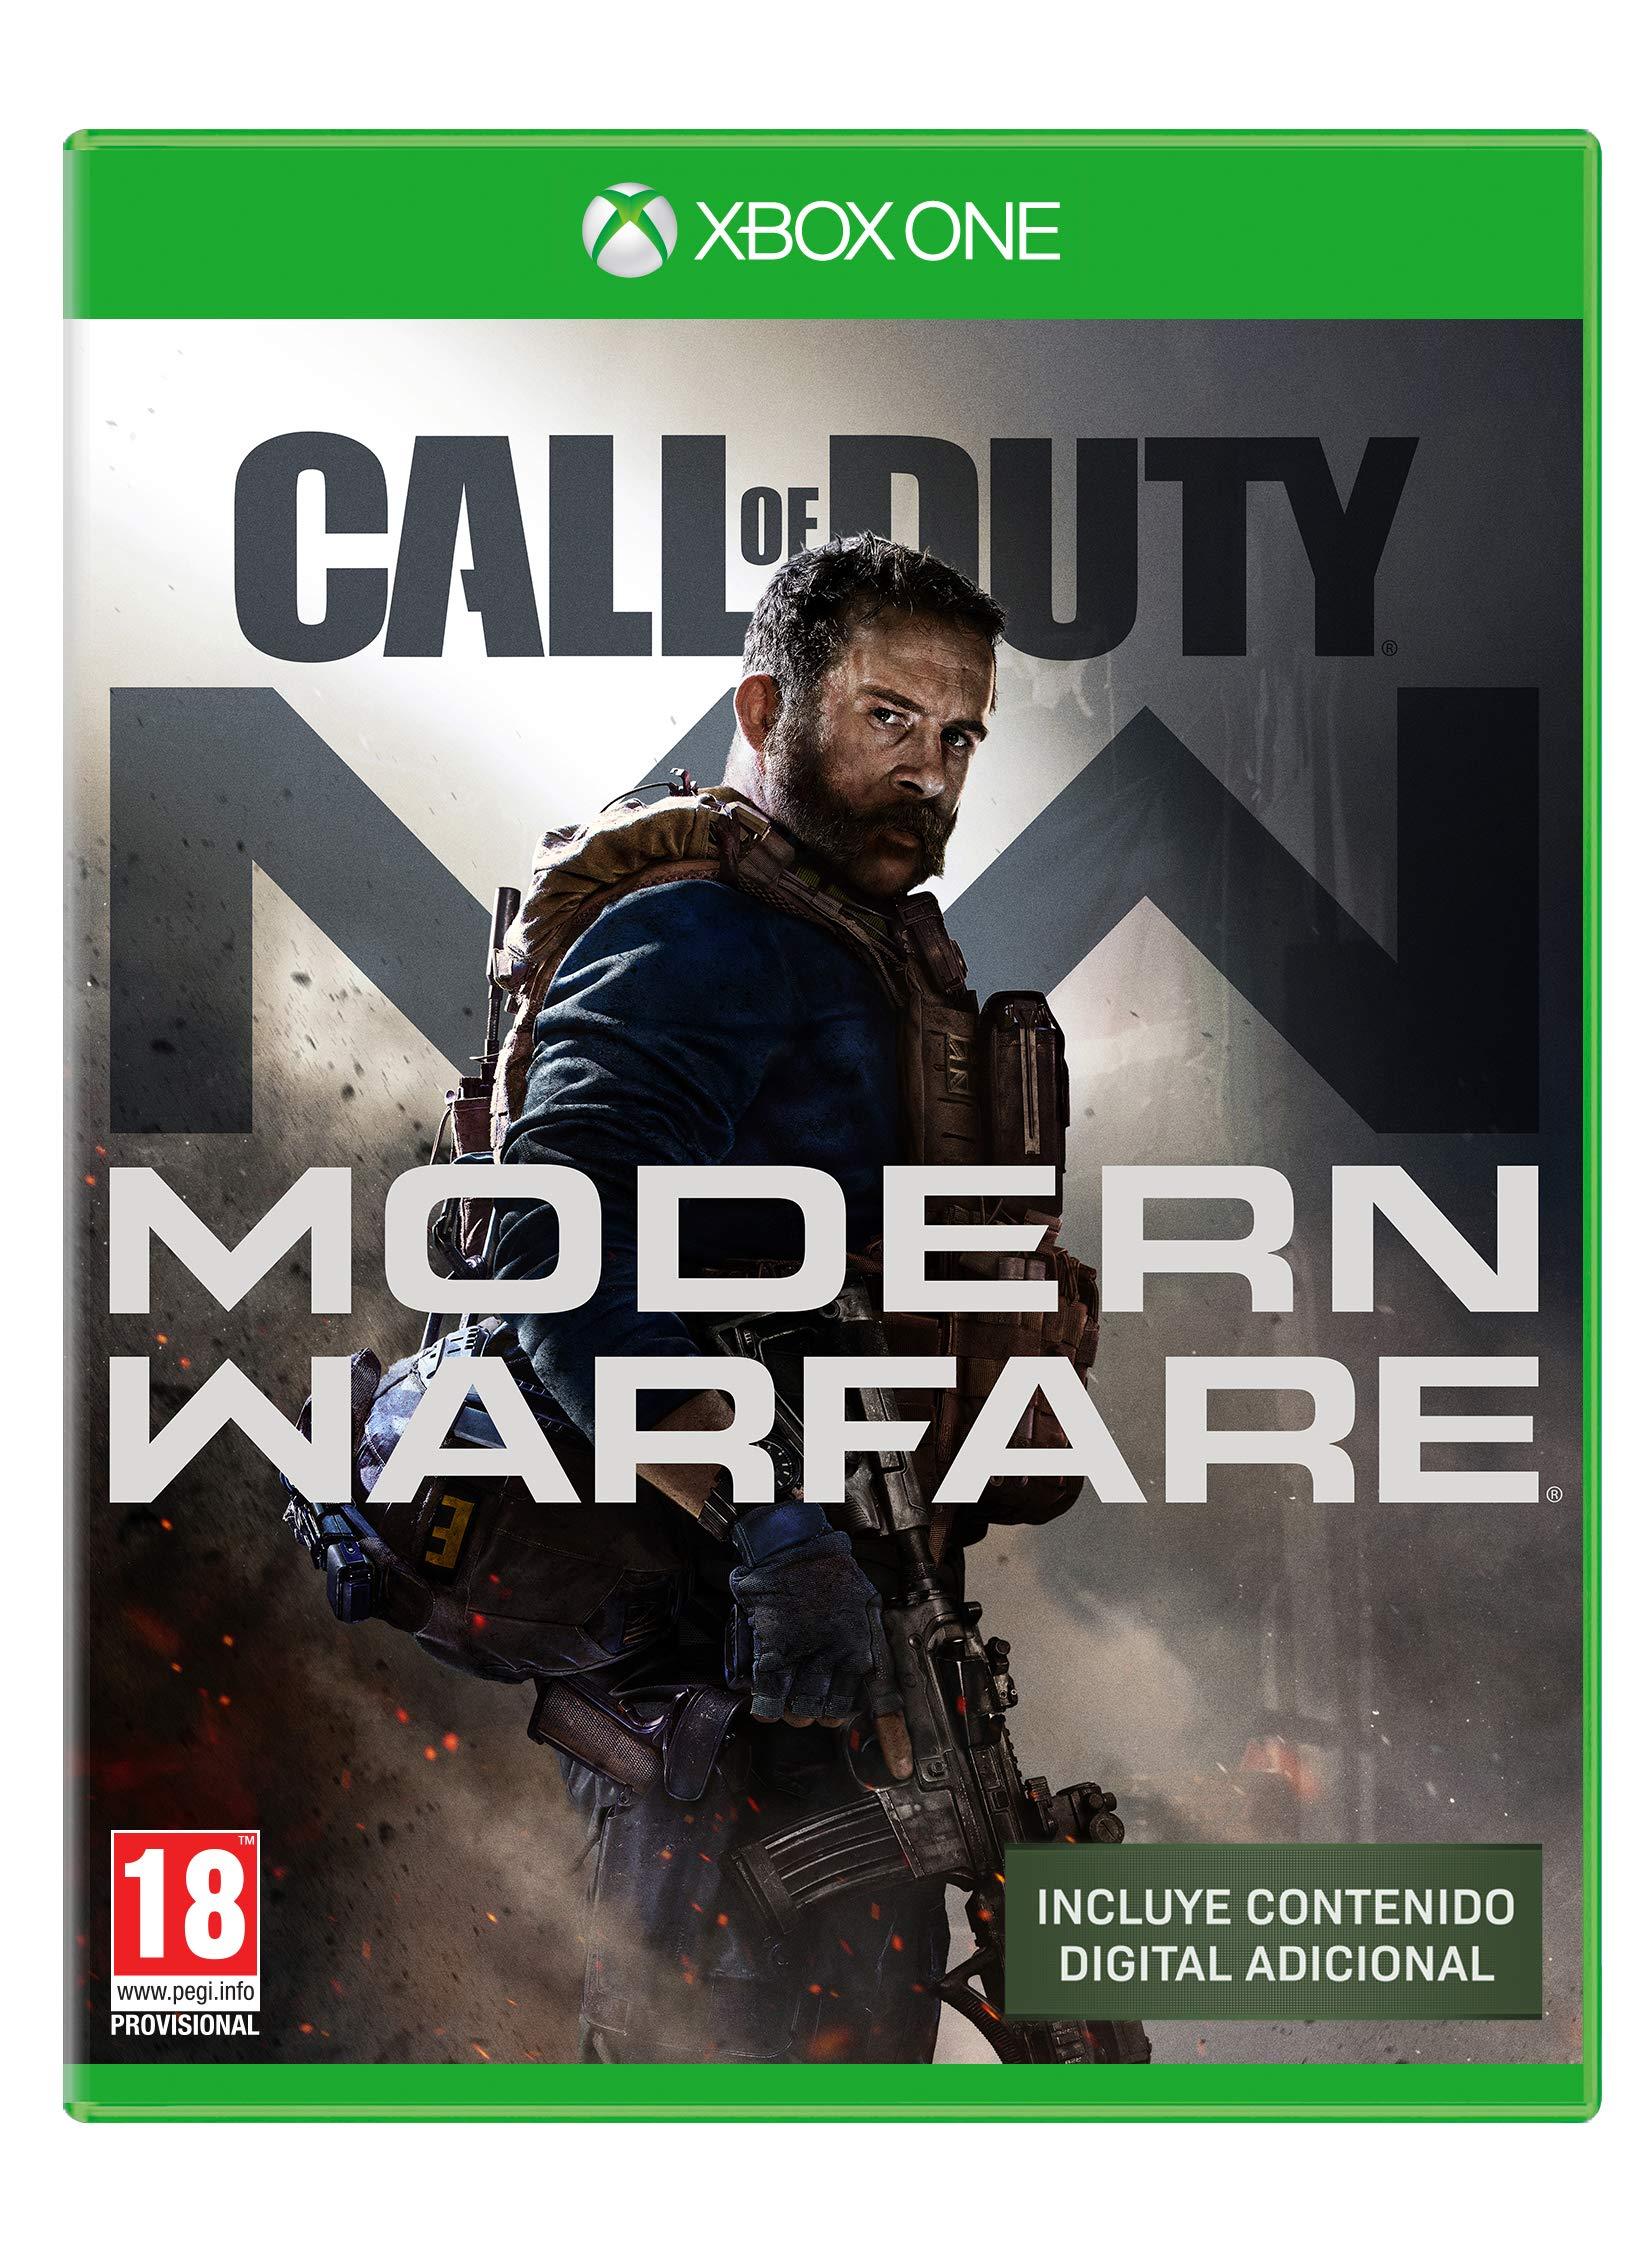 Call-of-Duty-Modern-Warfare-Edicin-Exclusiva-Amazon